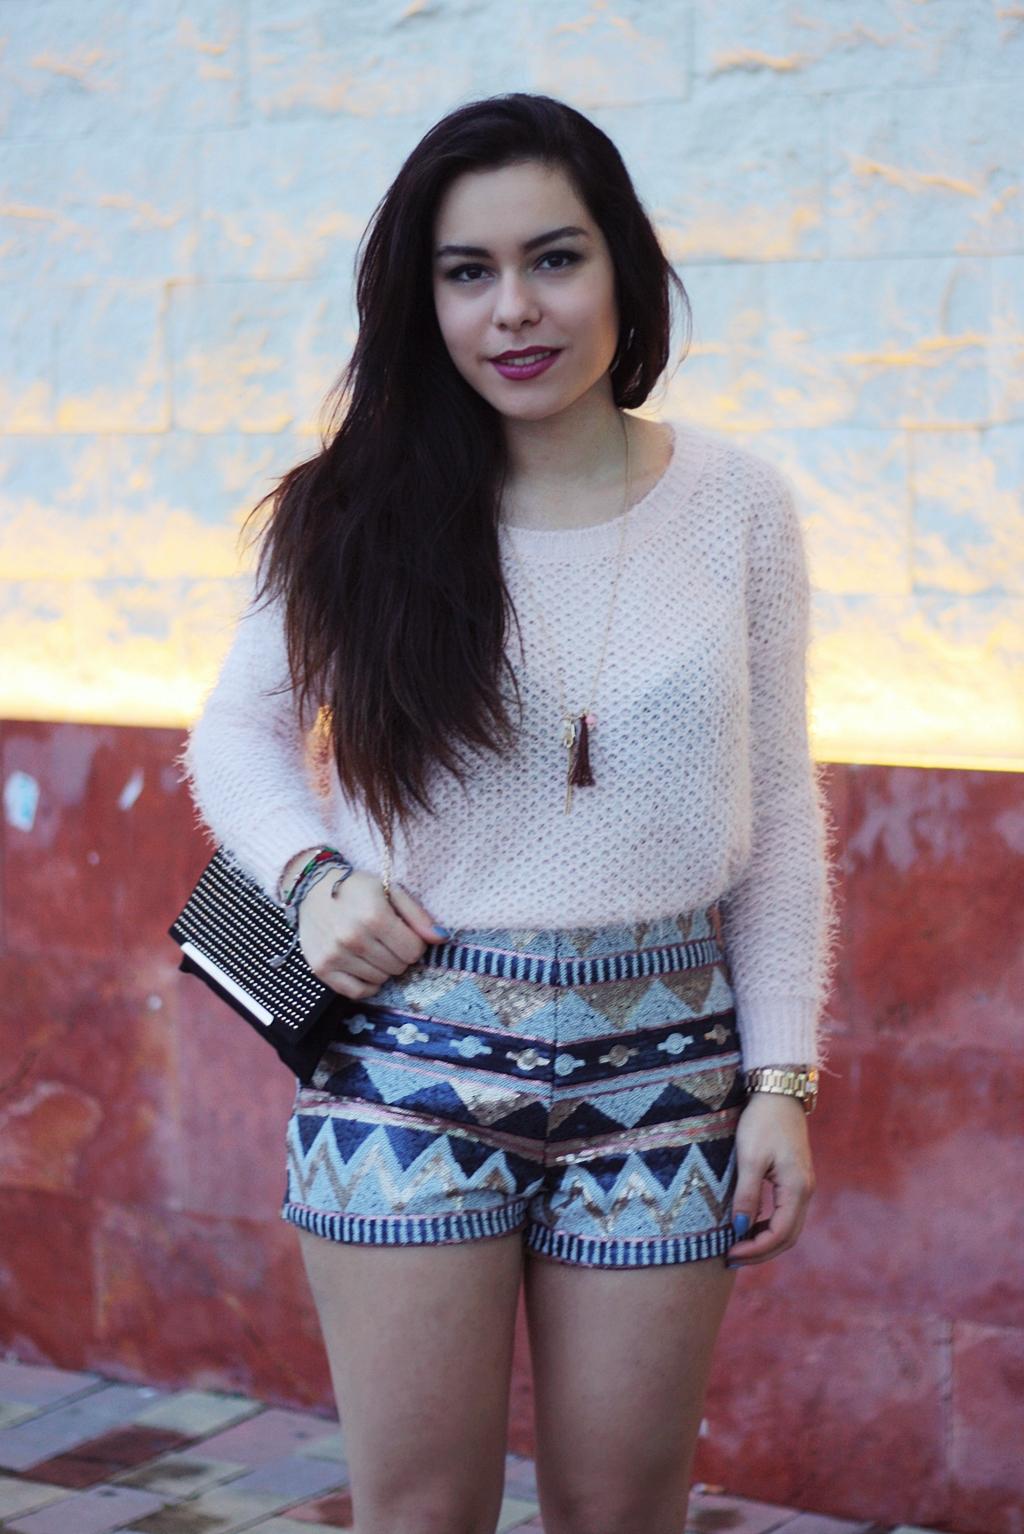 Outfit chic, shorts di paillettes Tally Weijl, maglione rosa pastello, clutch e scarpe Tata Italia, Mina Masotina, fashion blogger Bari